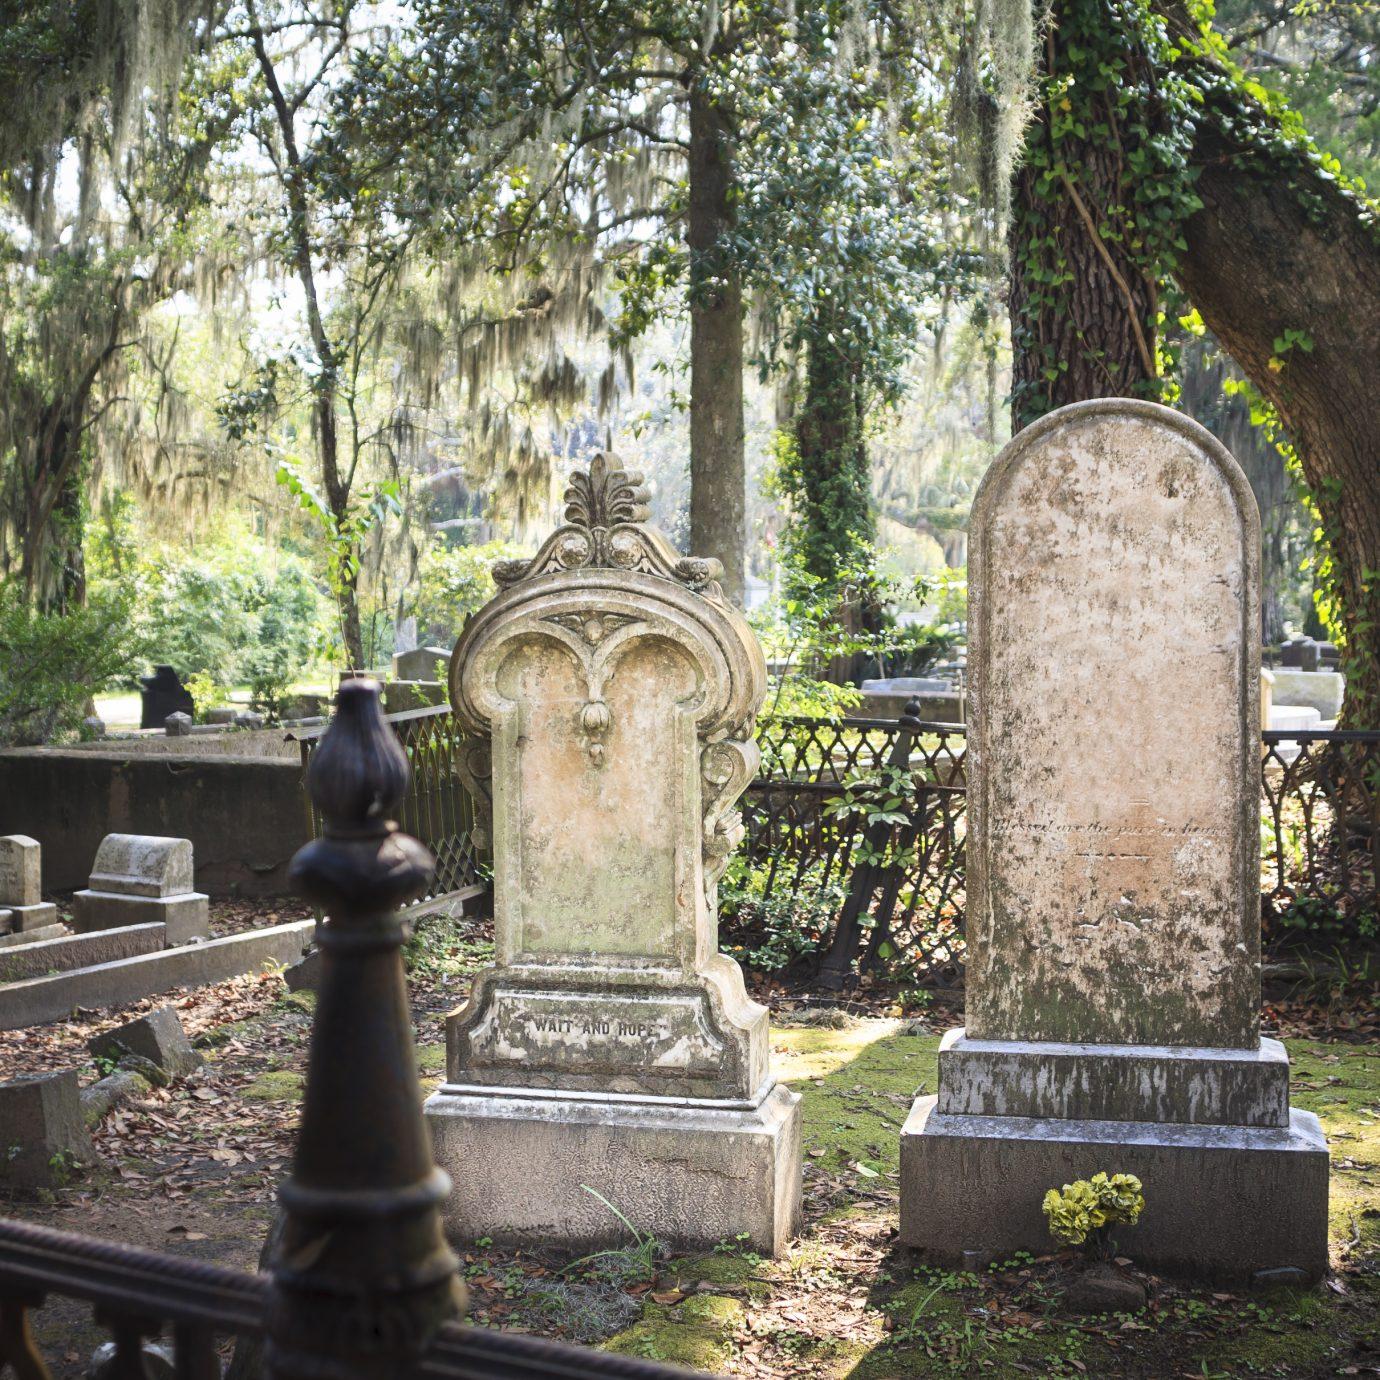 Tombstones and gravesite at Bonaventure Cemetery, Savannah, Georgia.